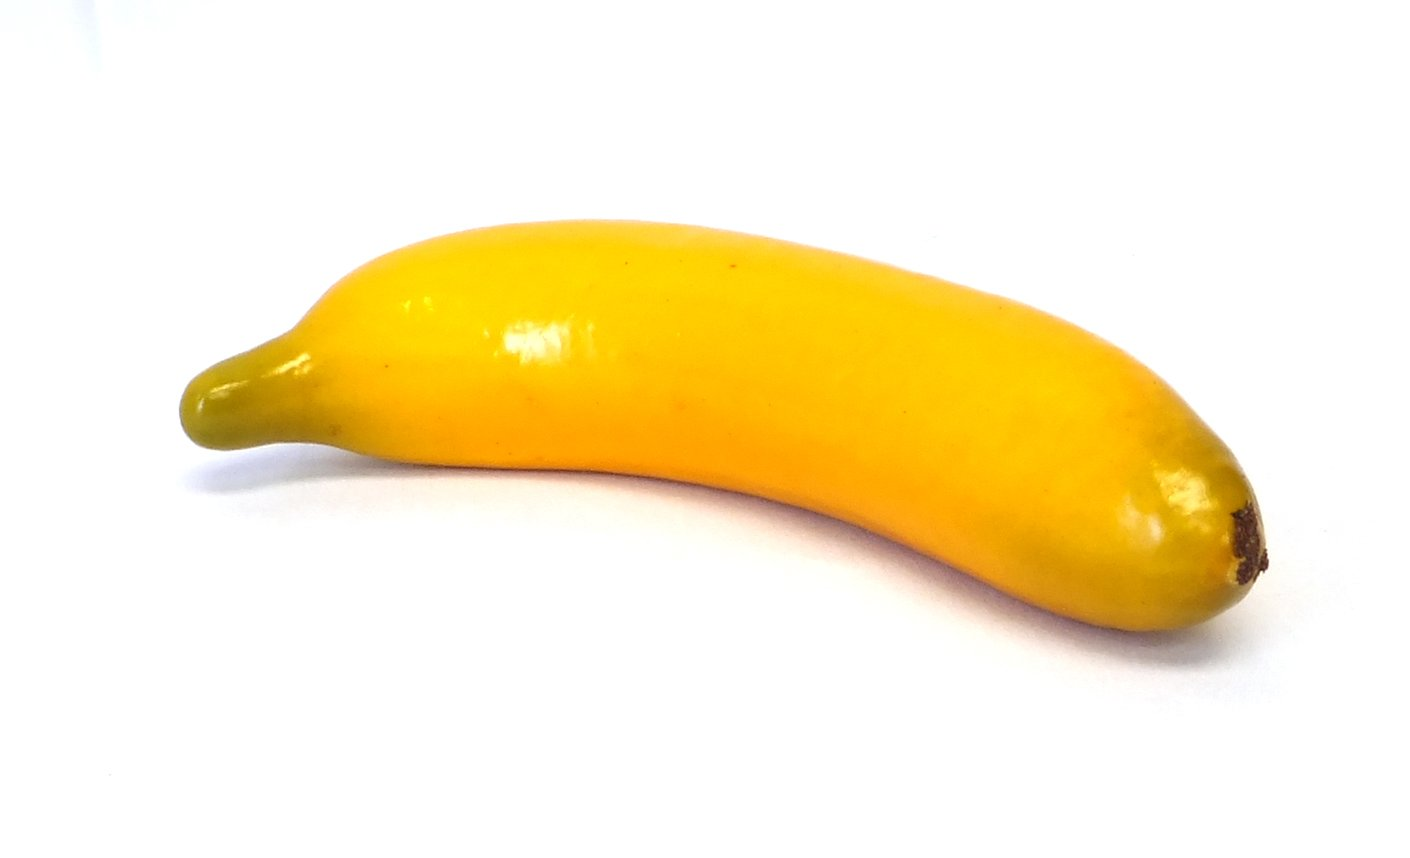 6pc Artificial Banana Bananas - Plastic Yellow Decorative Fruit - Six Pieces by Viabella (Image #1)